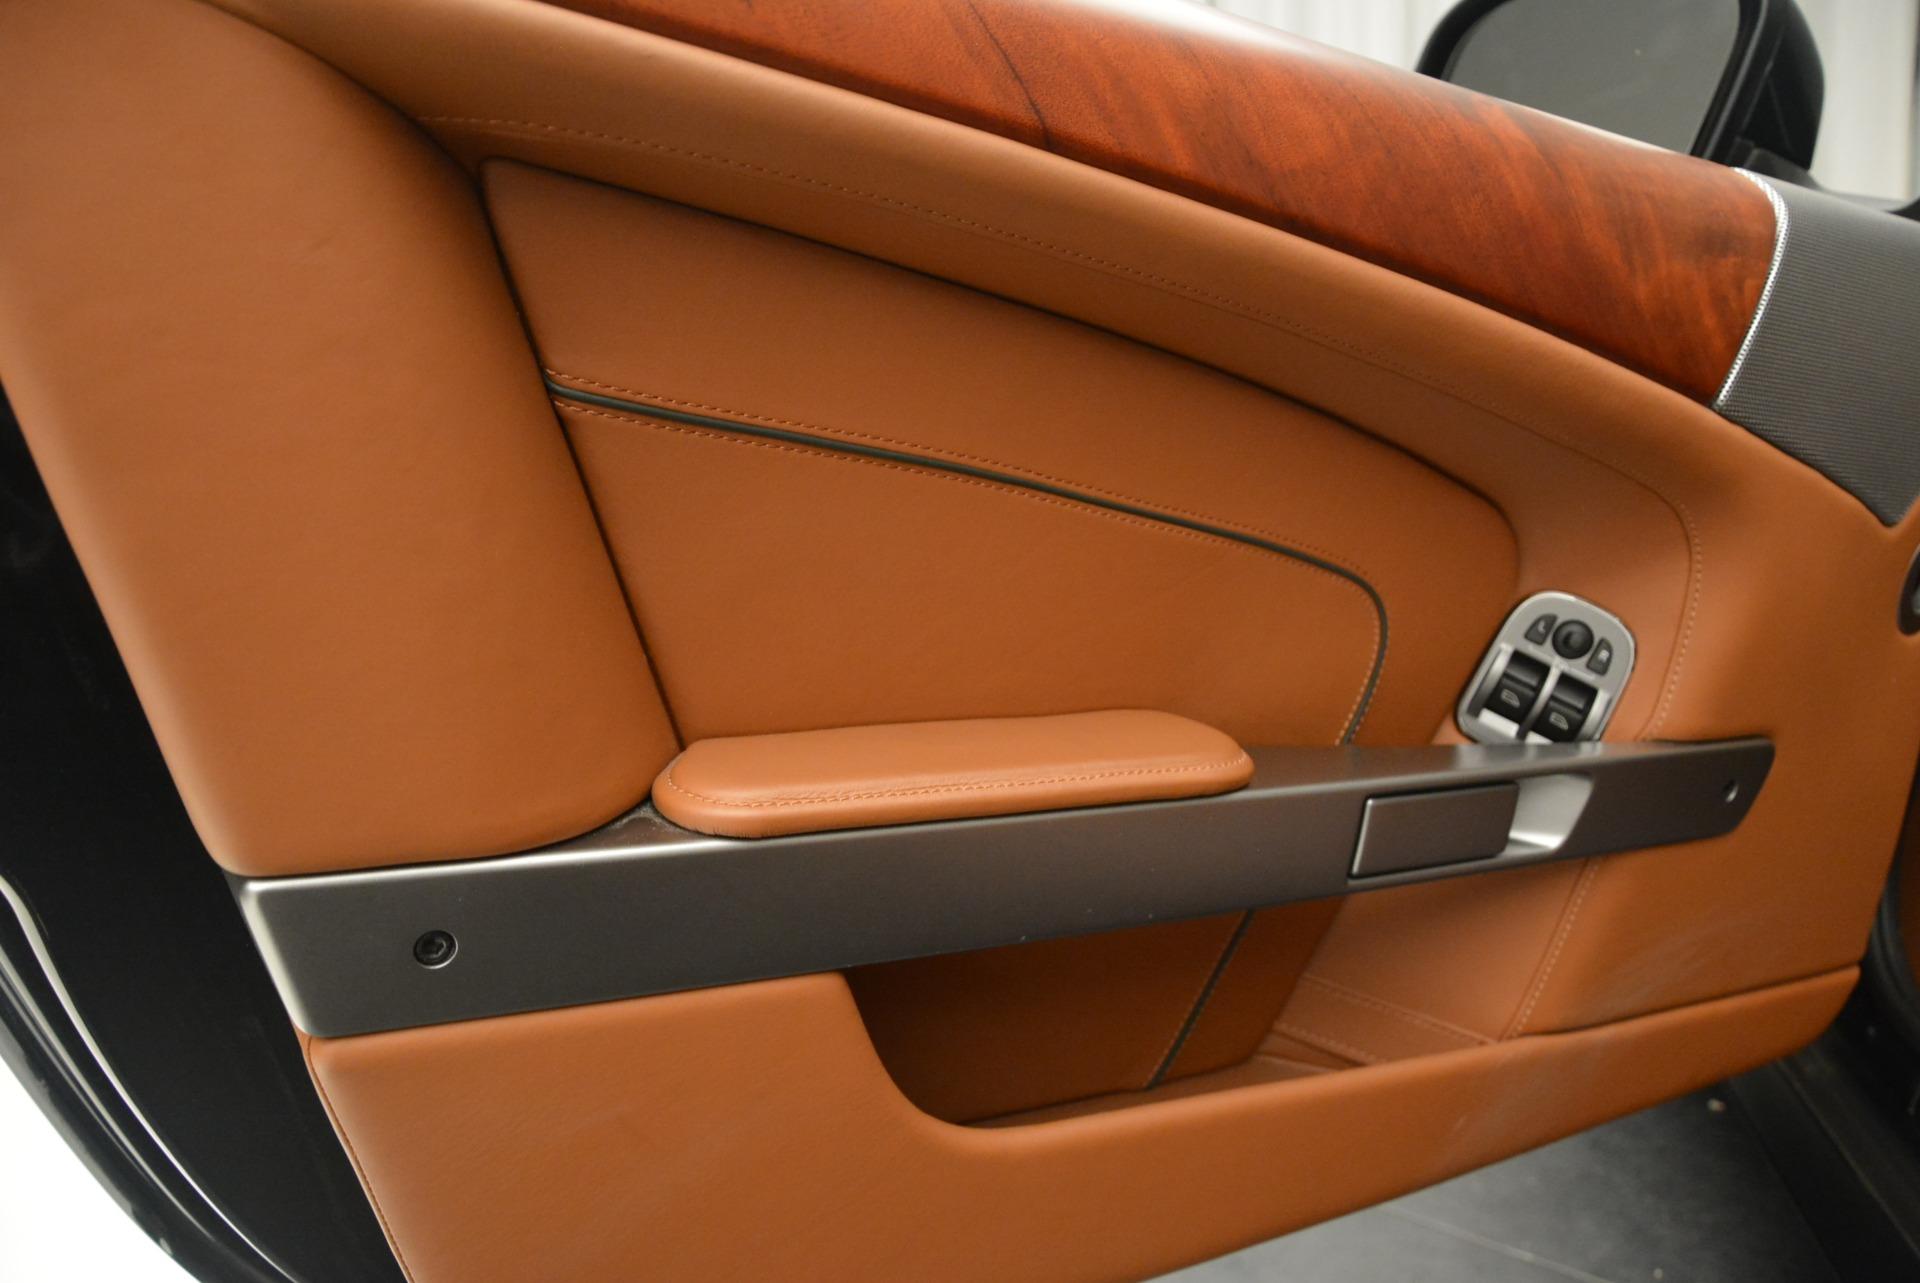 Used 2012 Aston Martin Virage Volante For Sale In Westport, CT 2508_p23